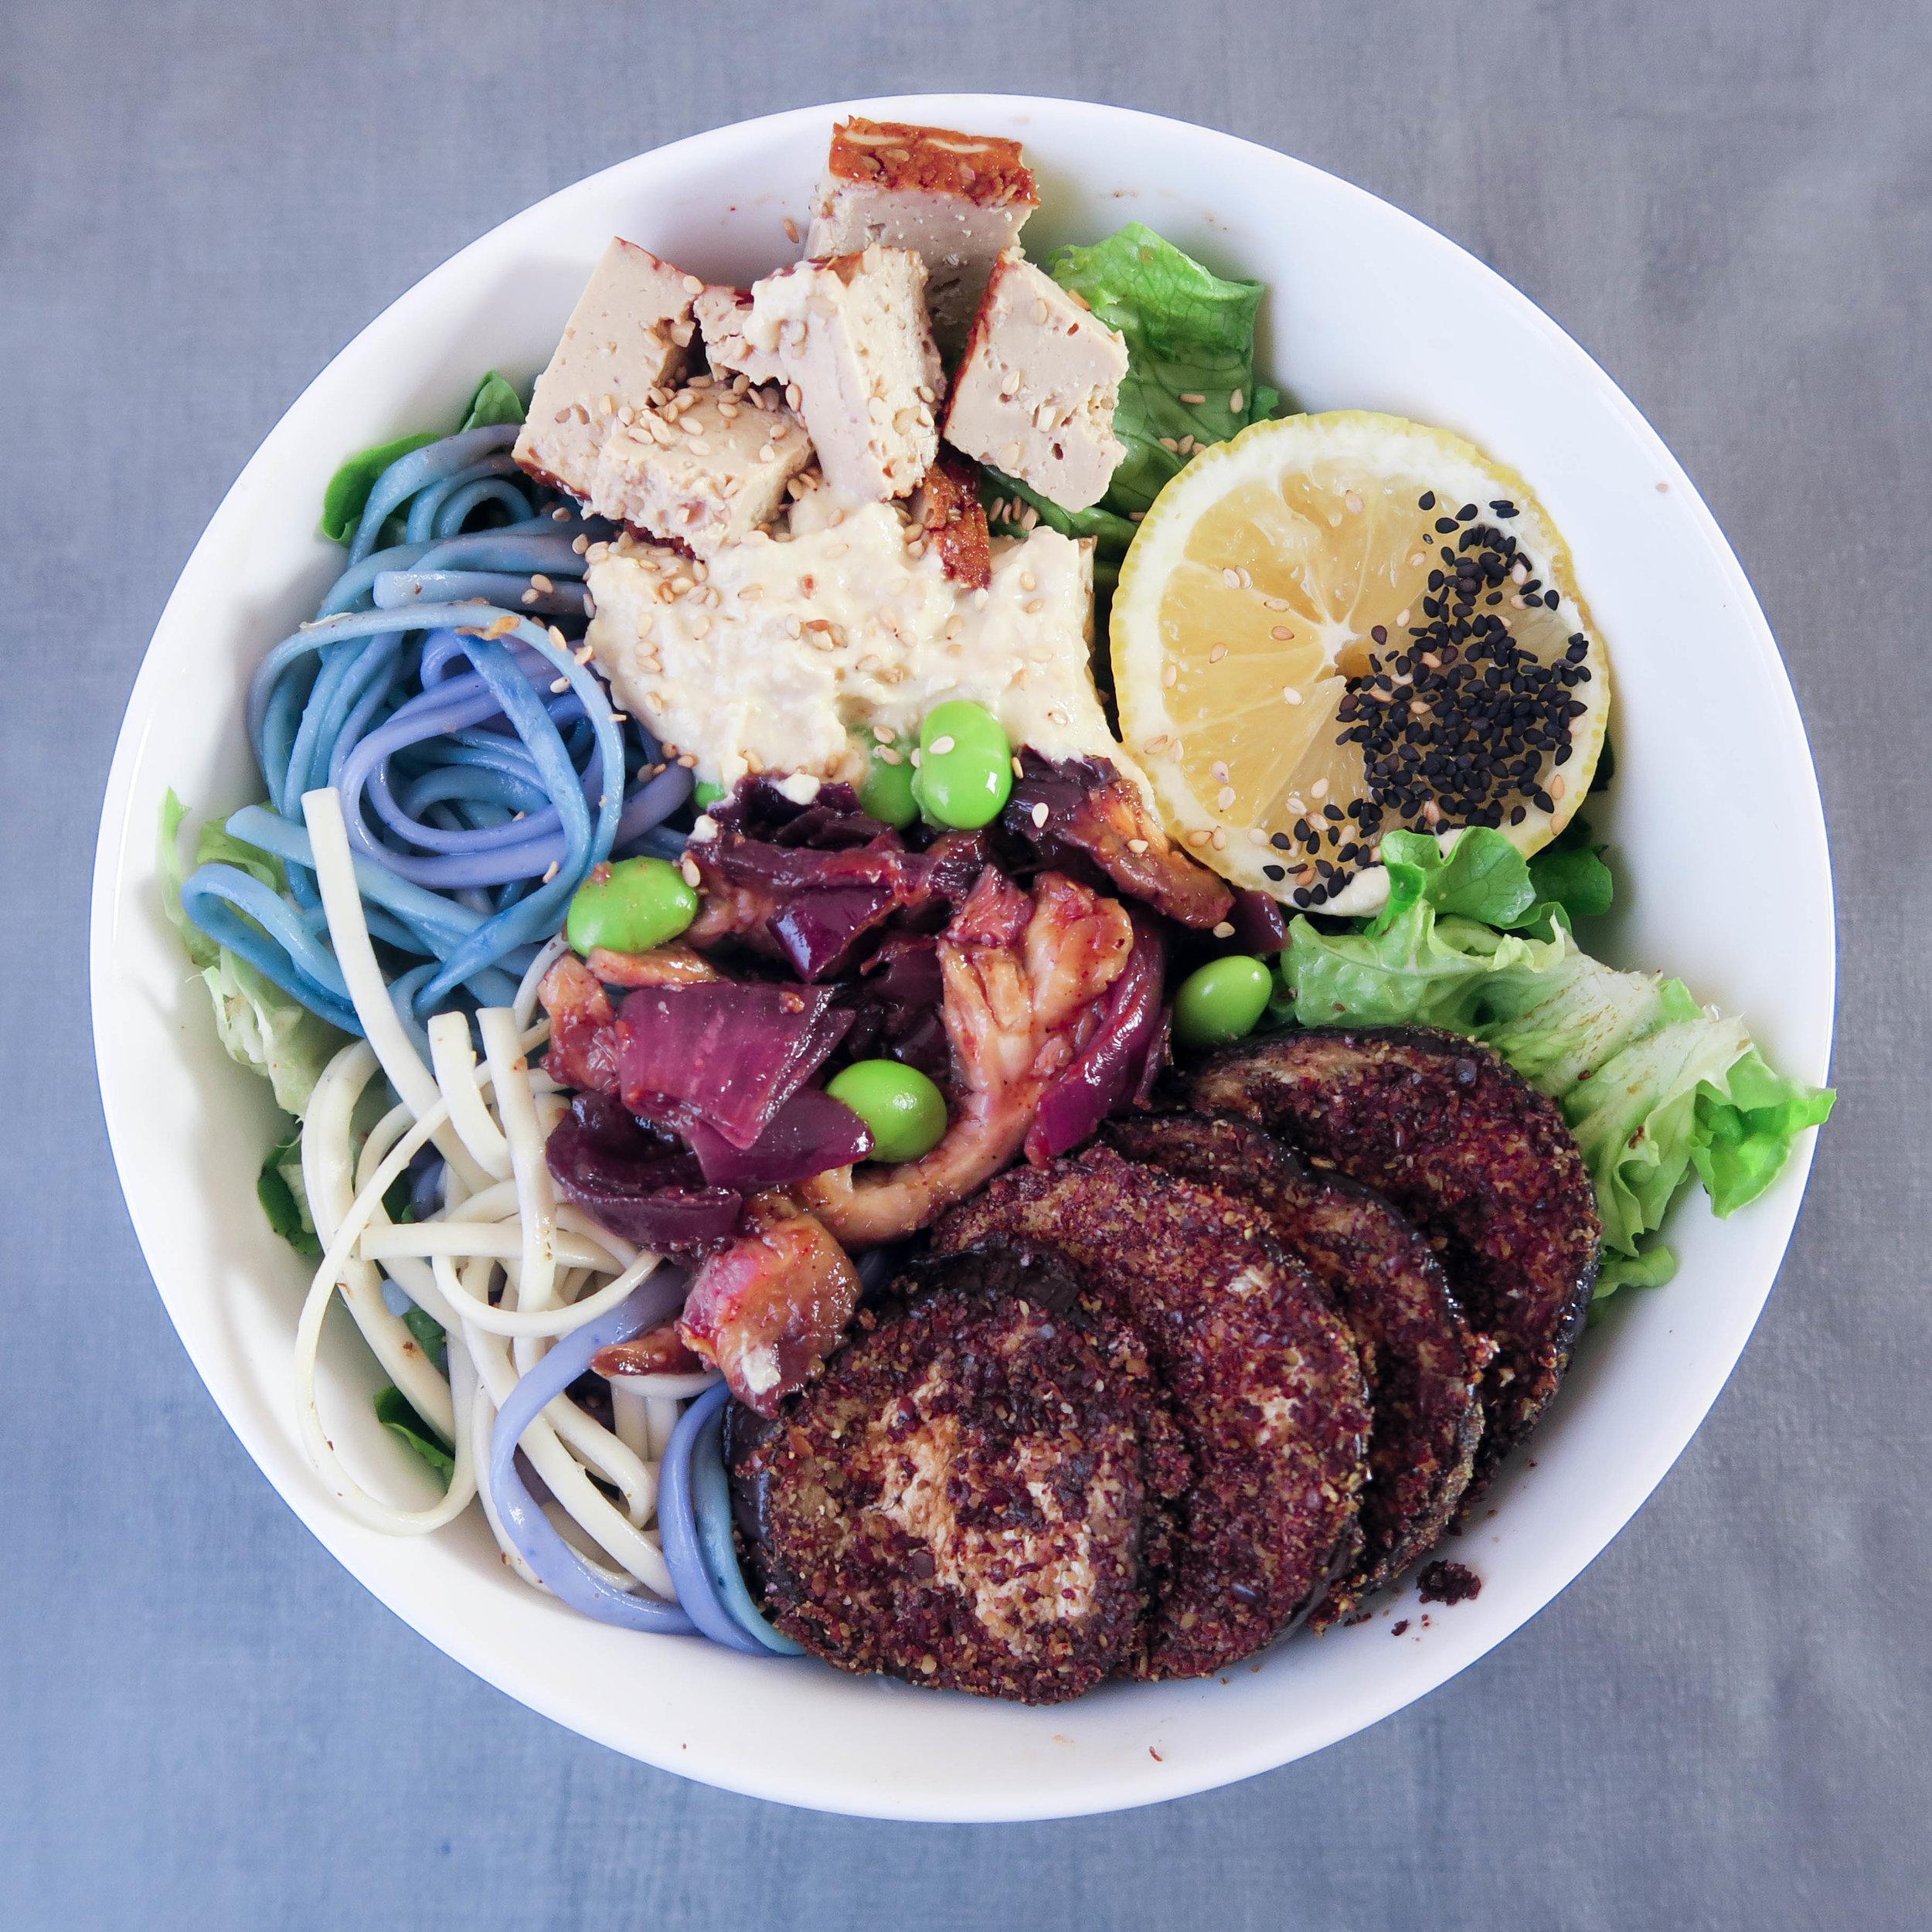 rainbow bowl : soba noodles with bluematcha, eggplant dips, teriyaki (recipe in ebook), greens, tofu, hummus, edamama.